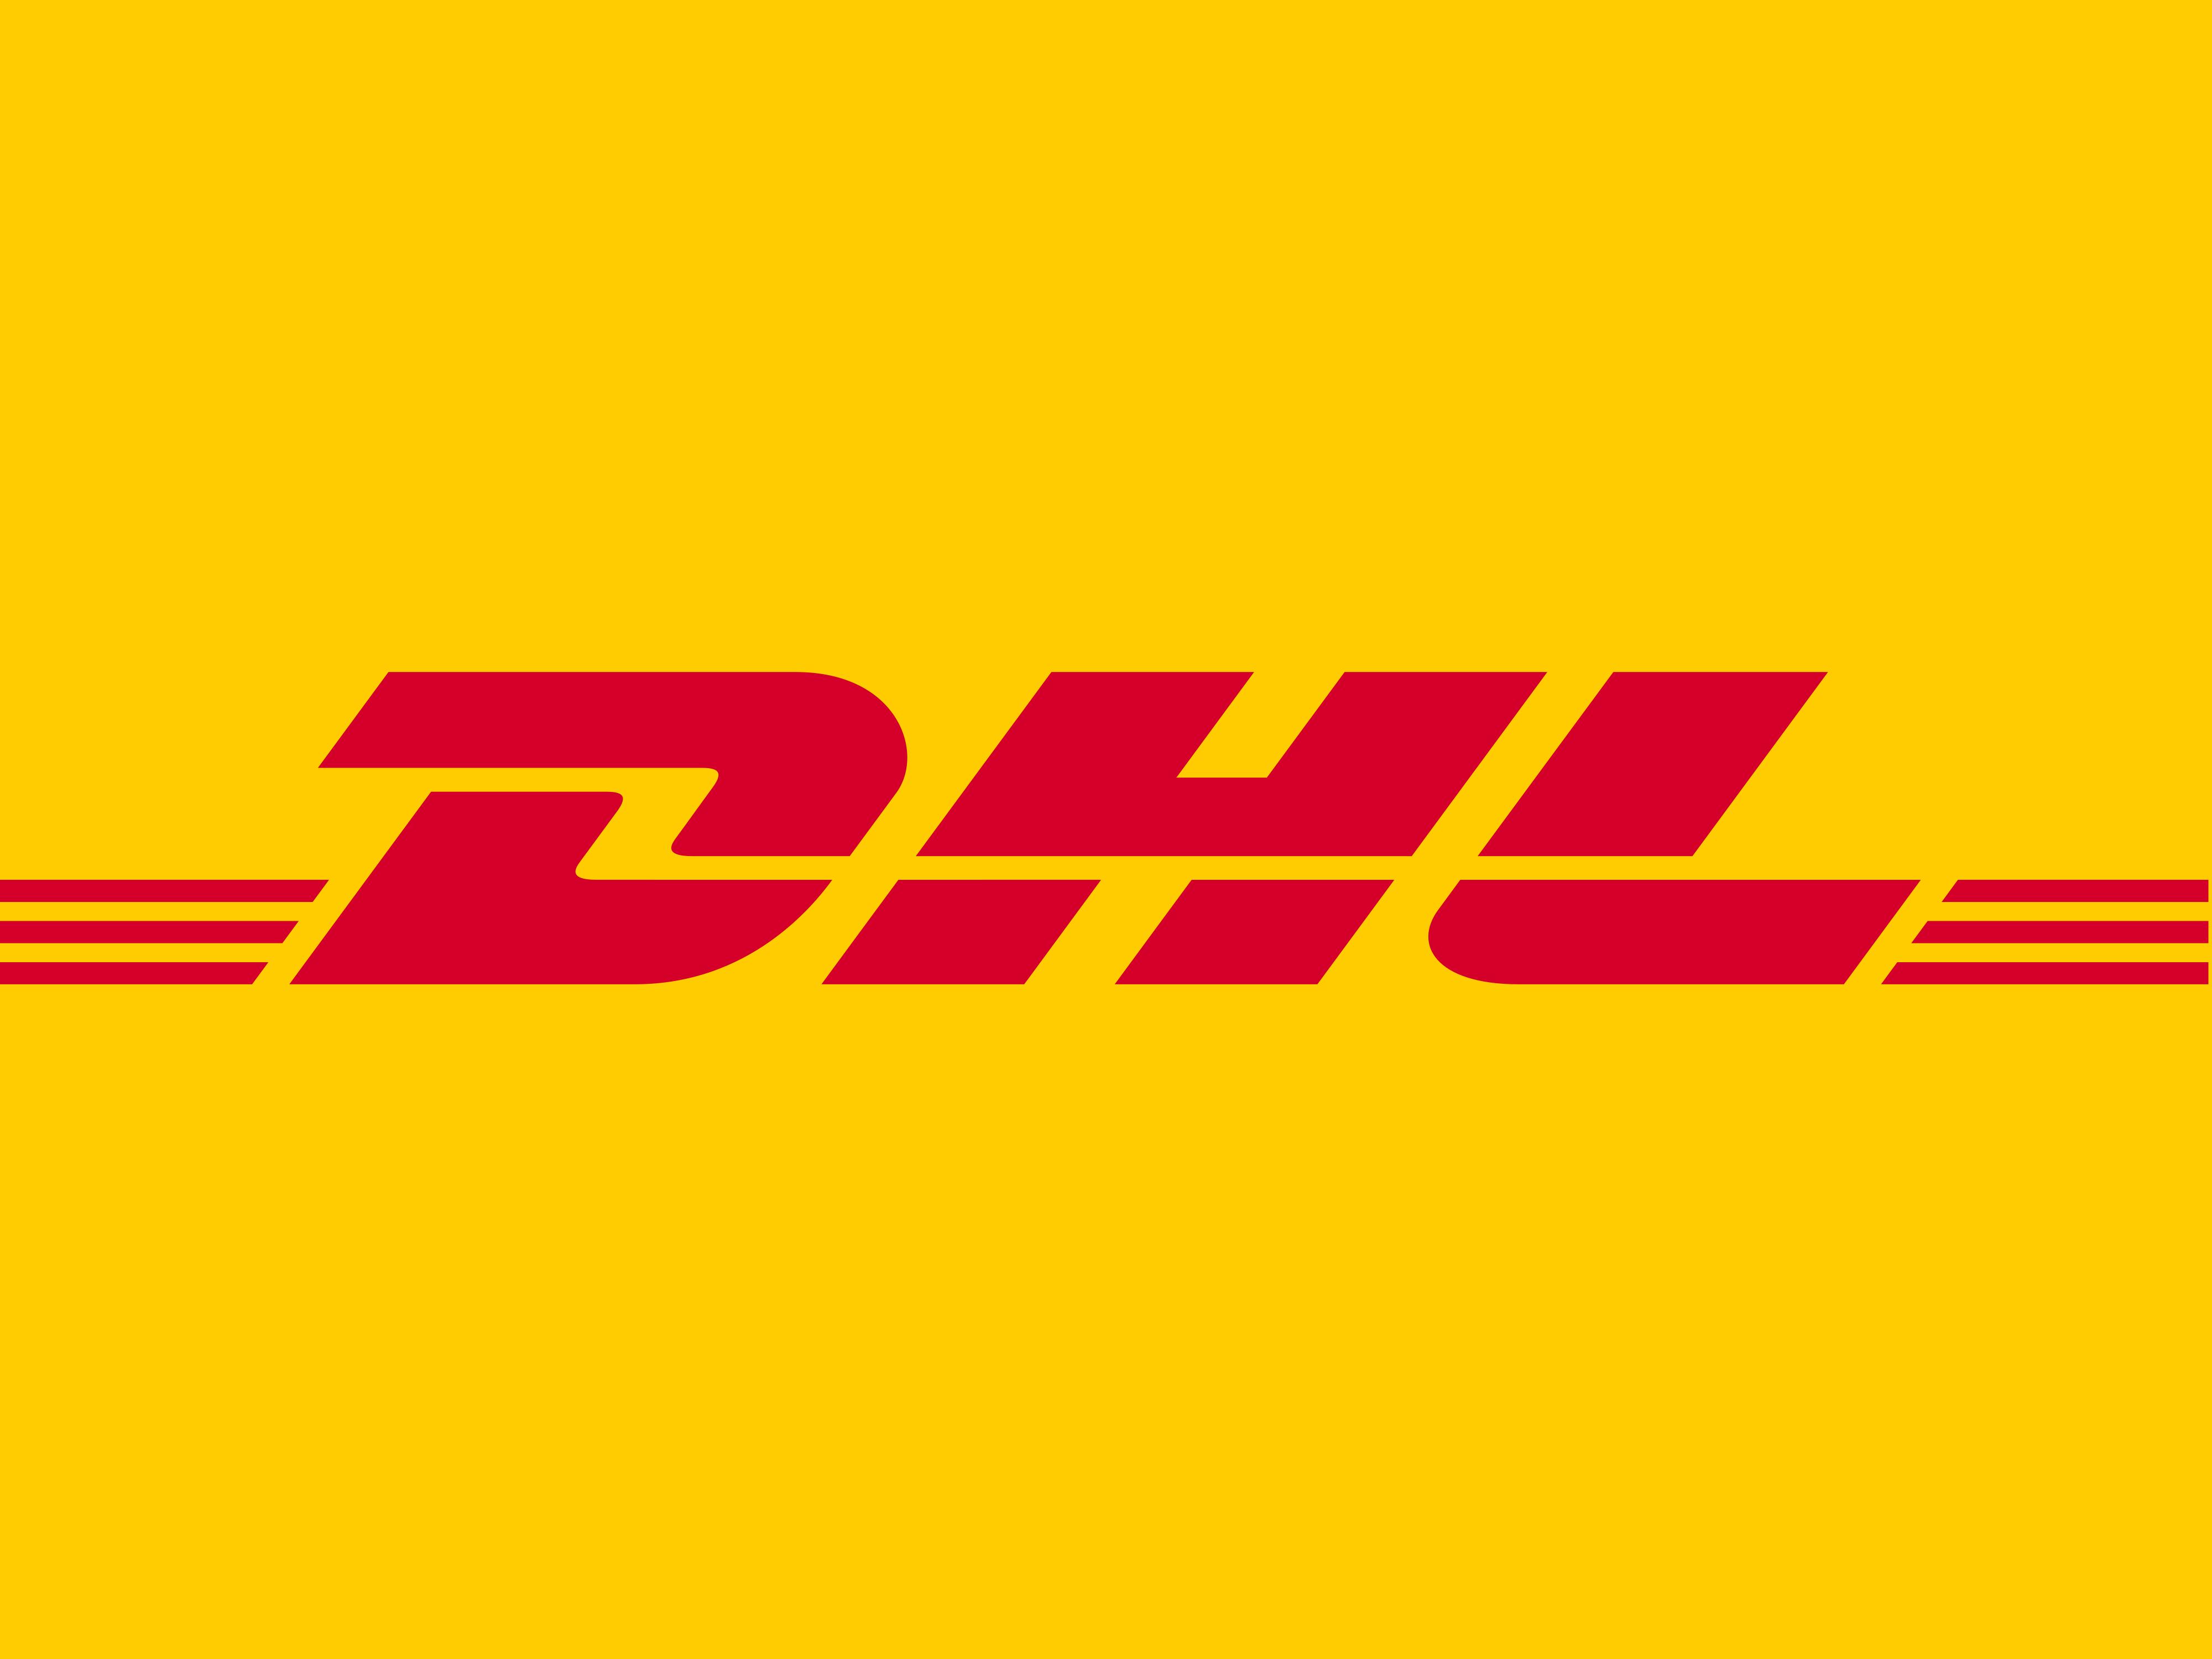 dhl logo 2 - DHL Logo